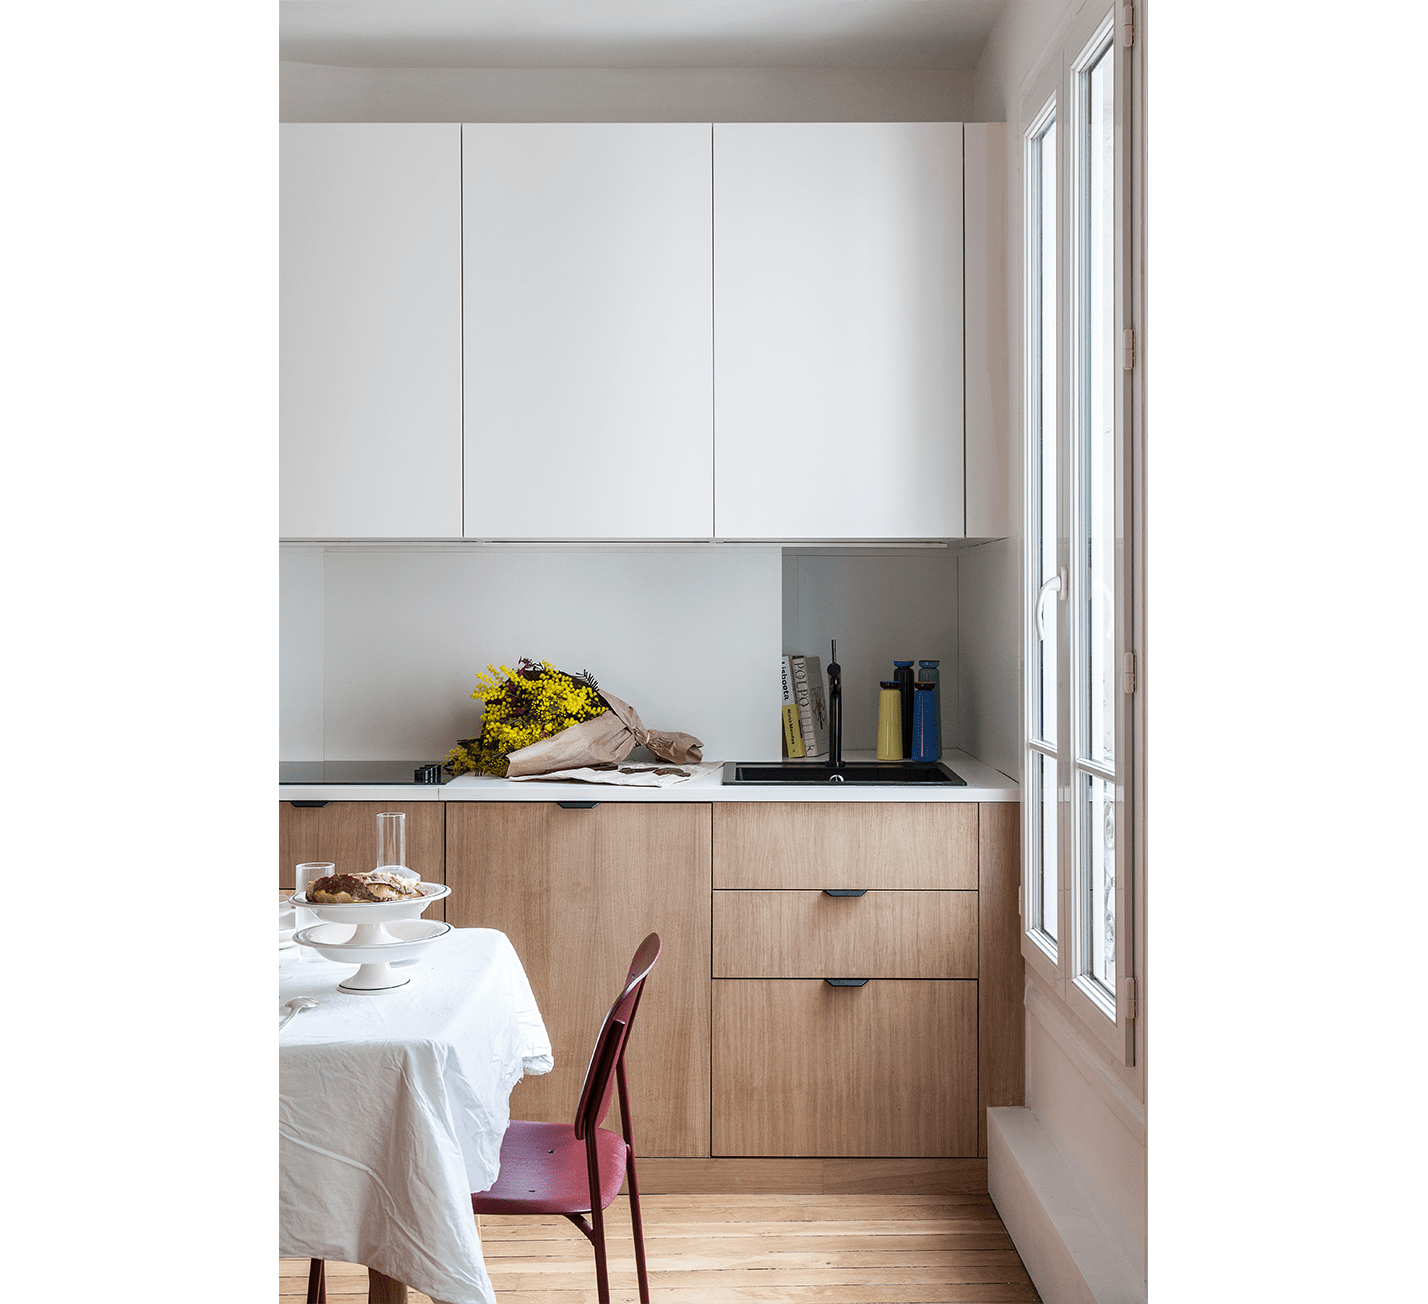 Projet-Cavallotti-Atelier-Steve-Pauline-Borgia-Architecte-interieur-01-min